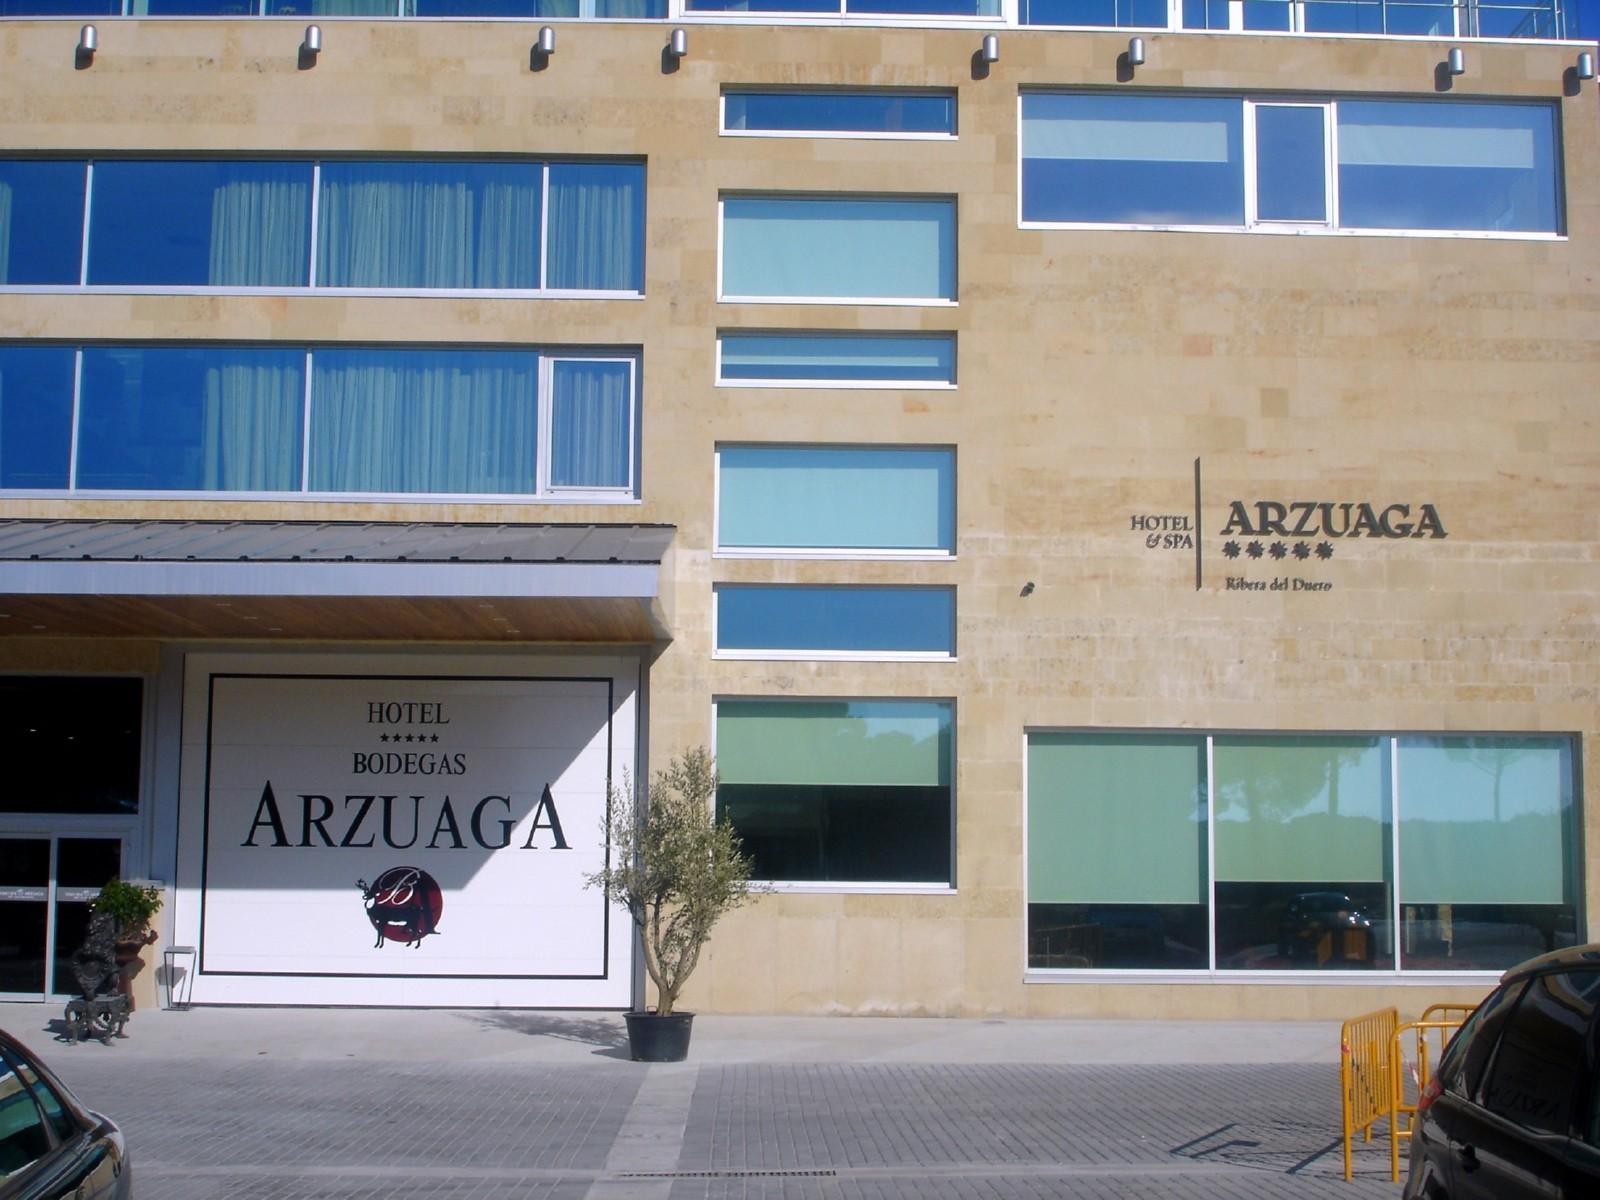 Bodegas Hotel Arzuaga-Navarro 28